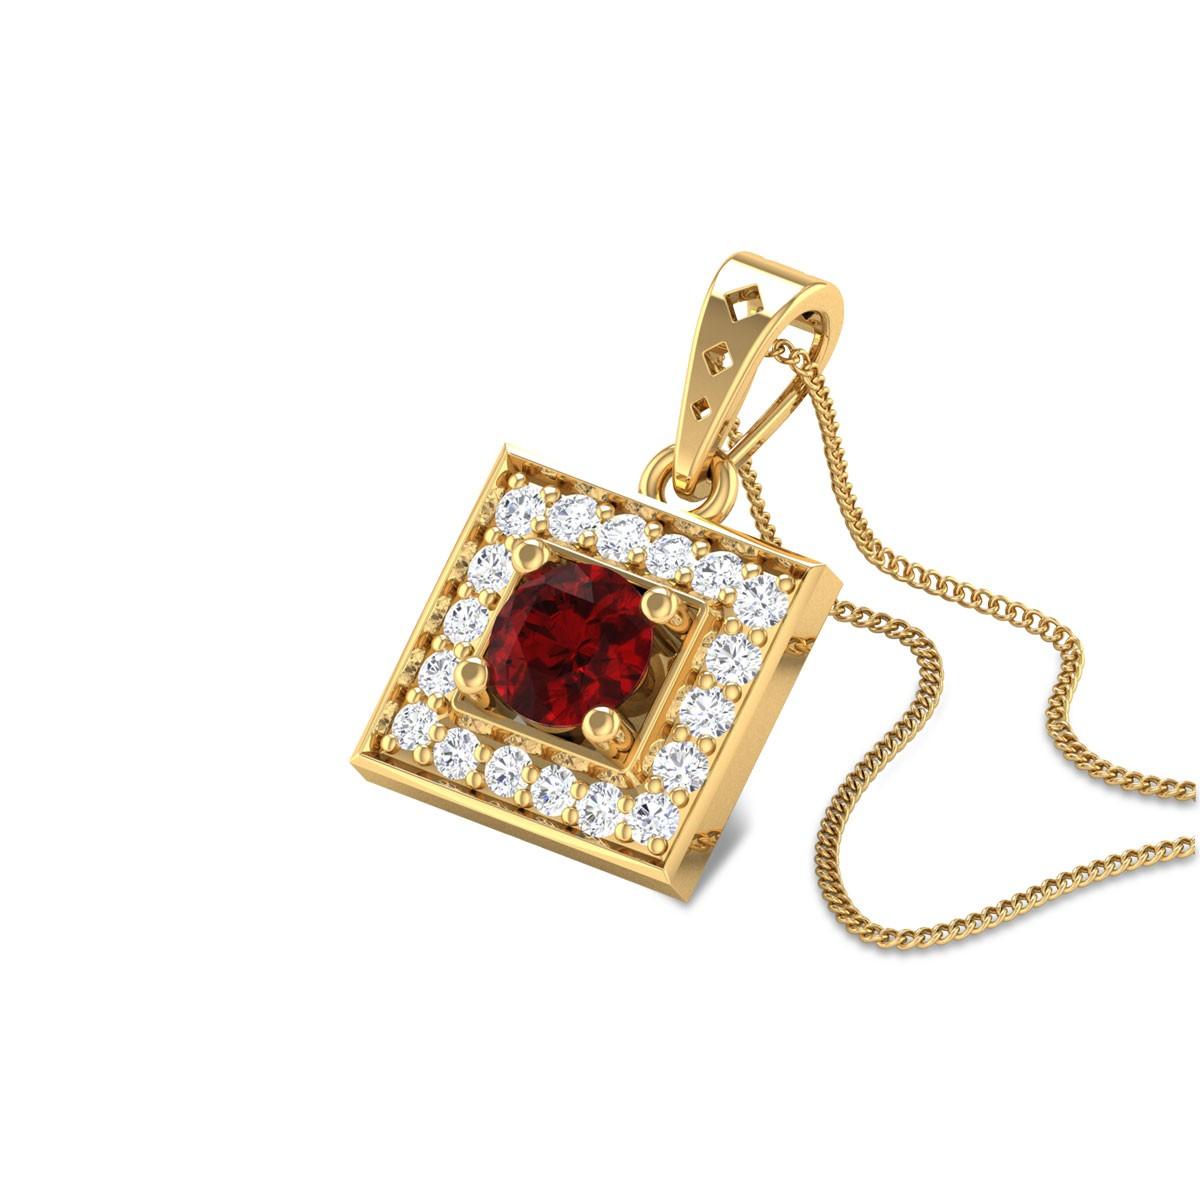 Afaaf Royal Ruby Pendant